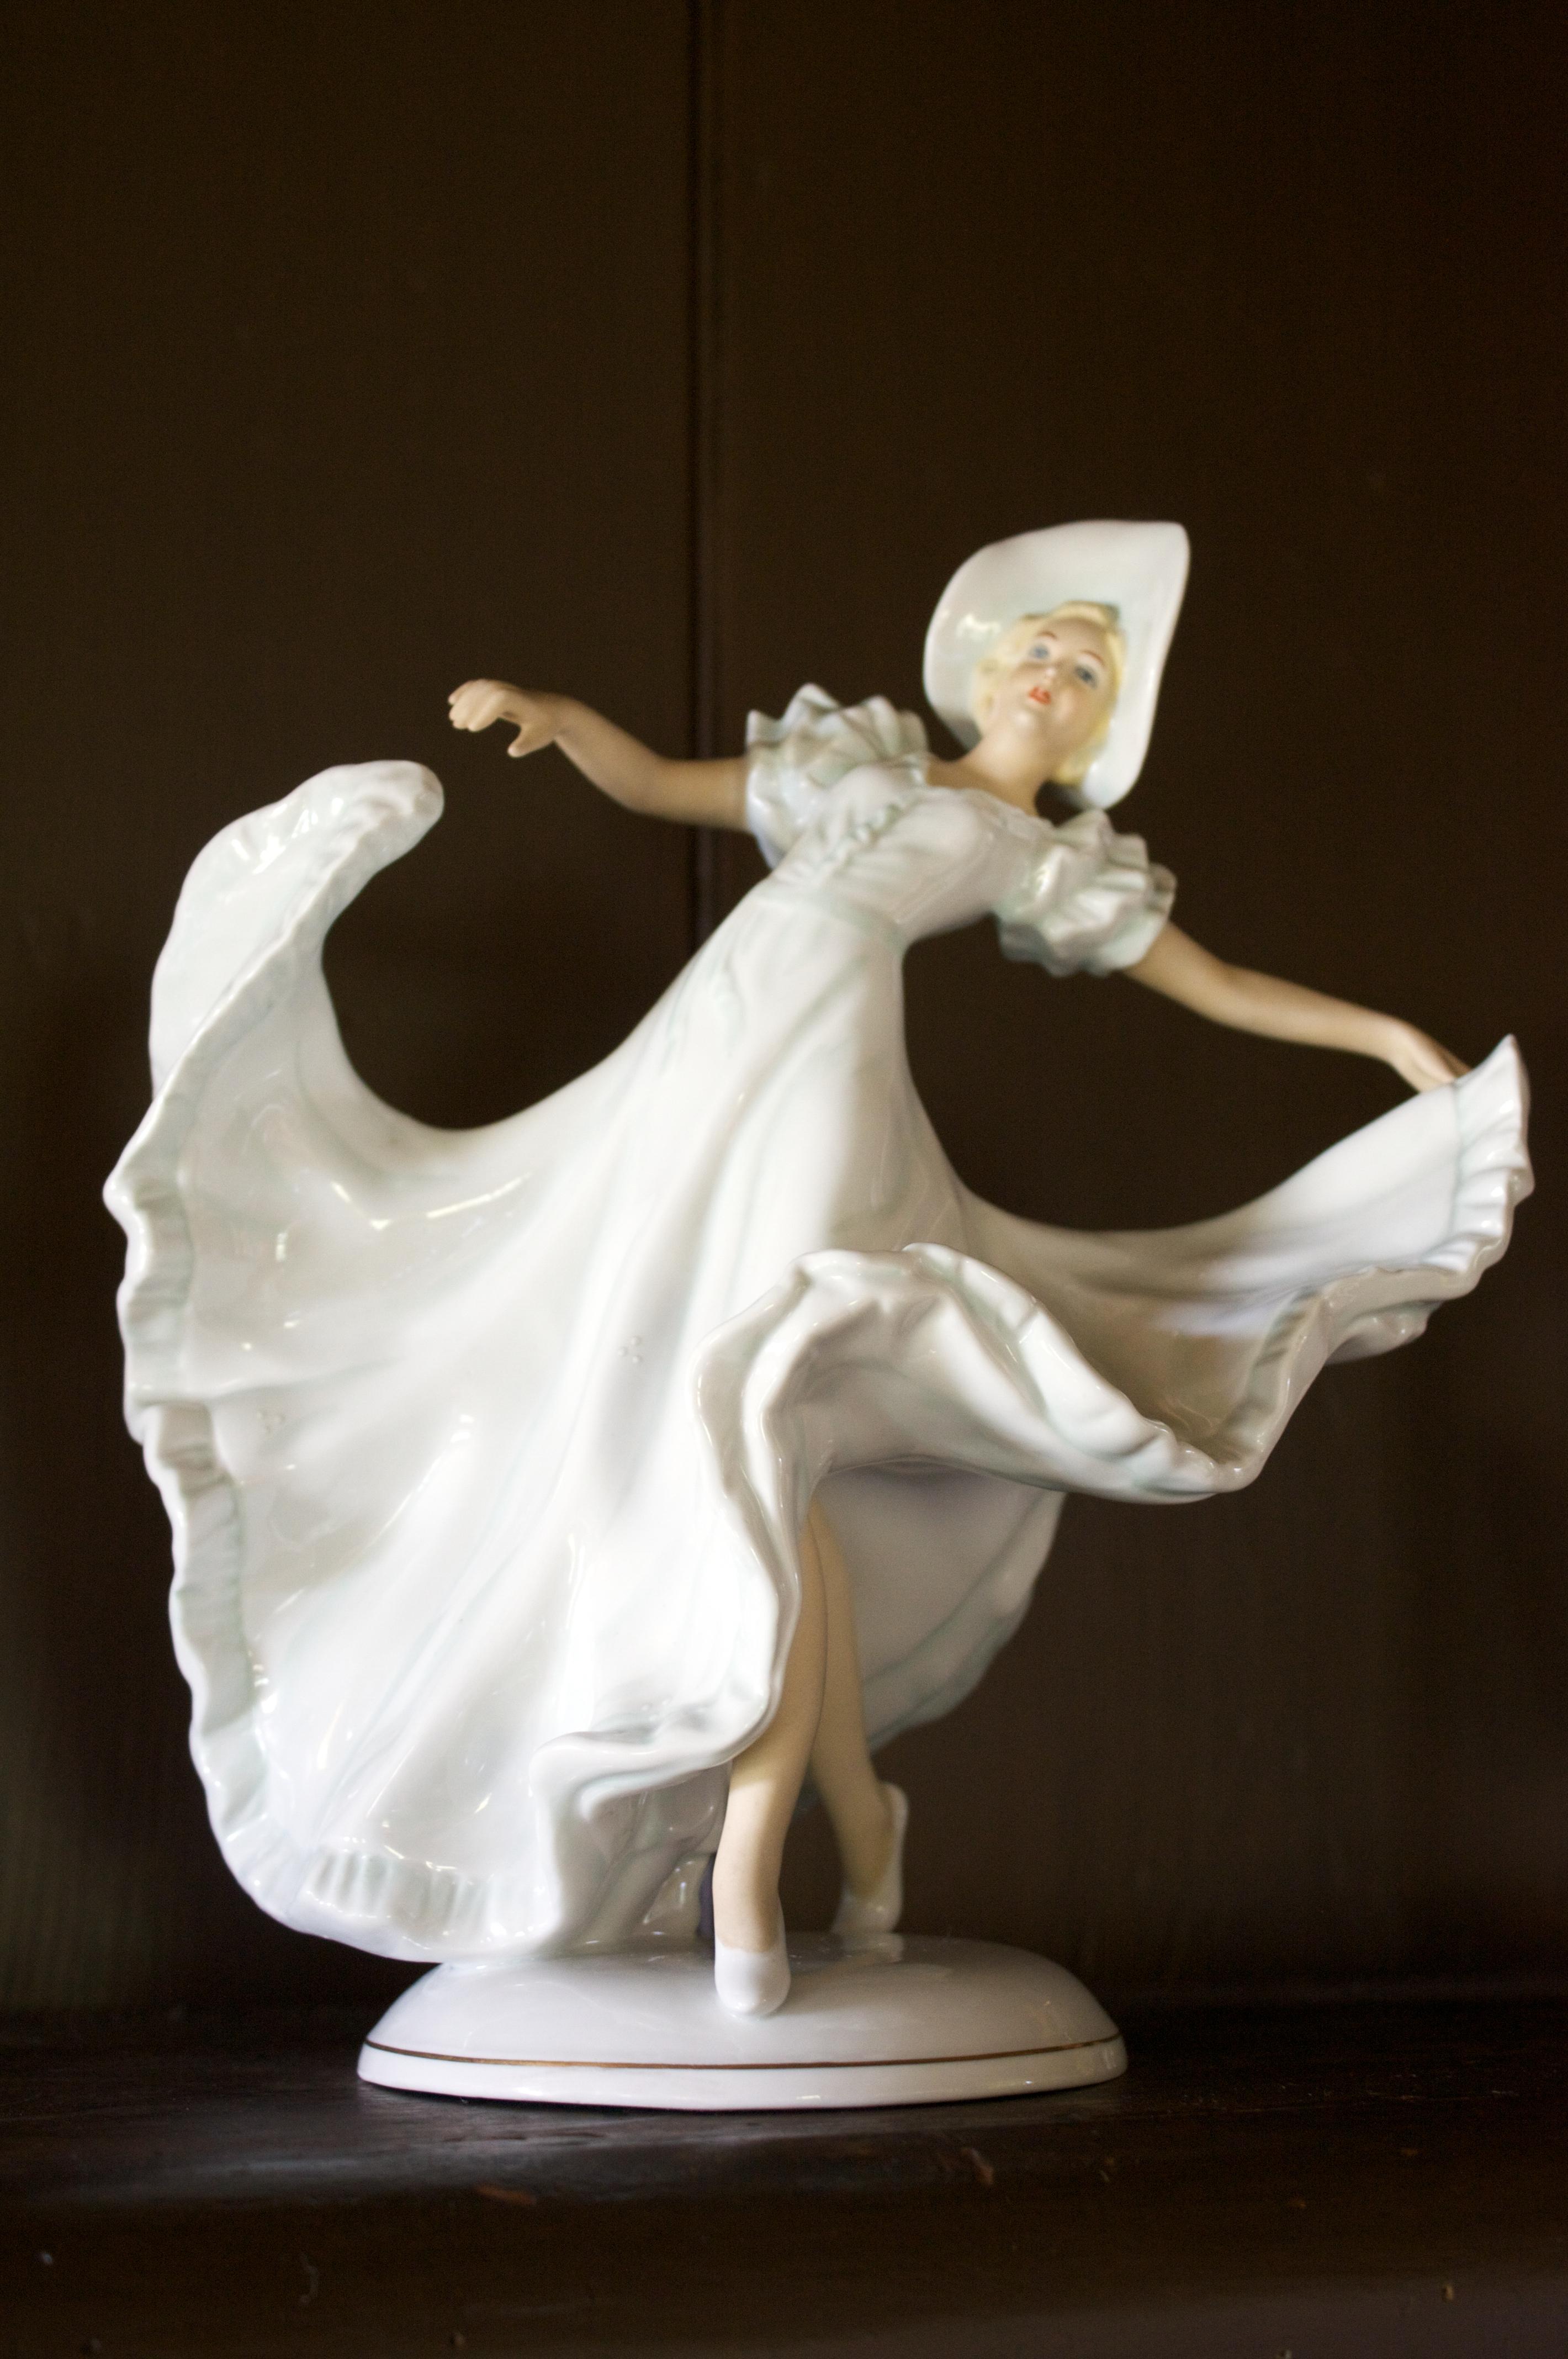 b8e8c749b List of Royal Doulton figurines - Wikipedia